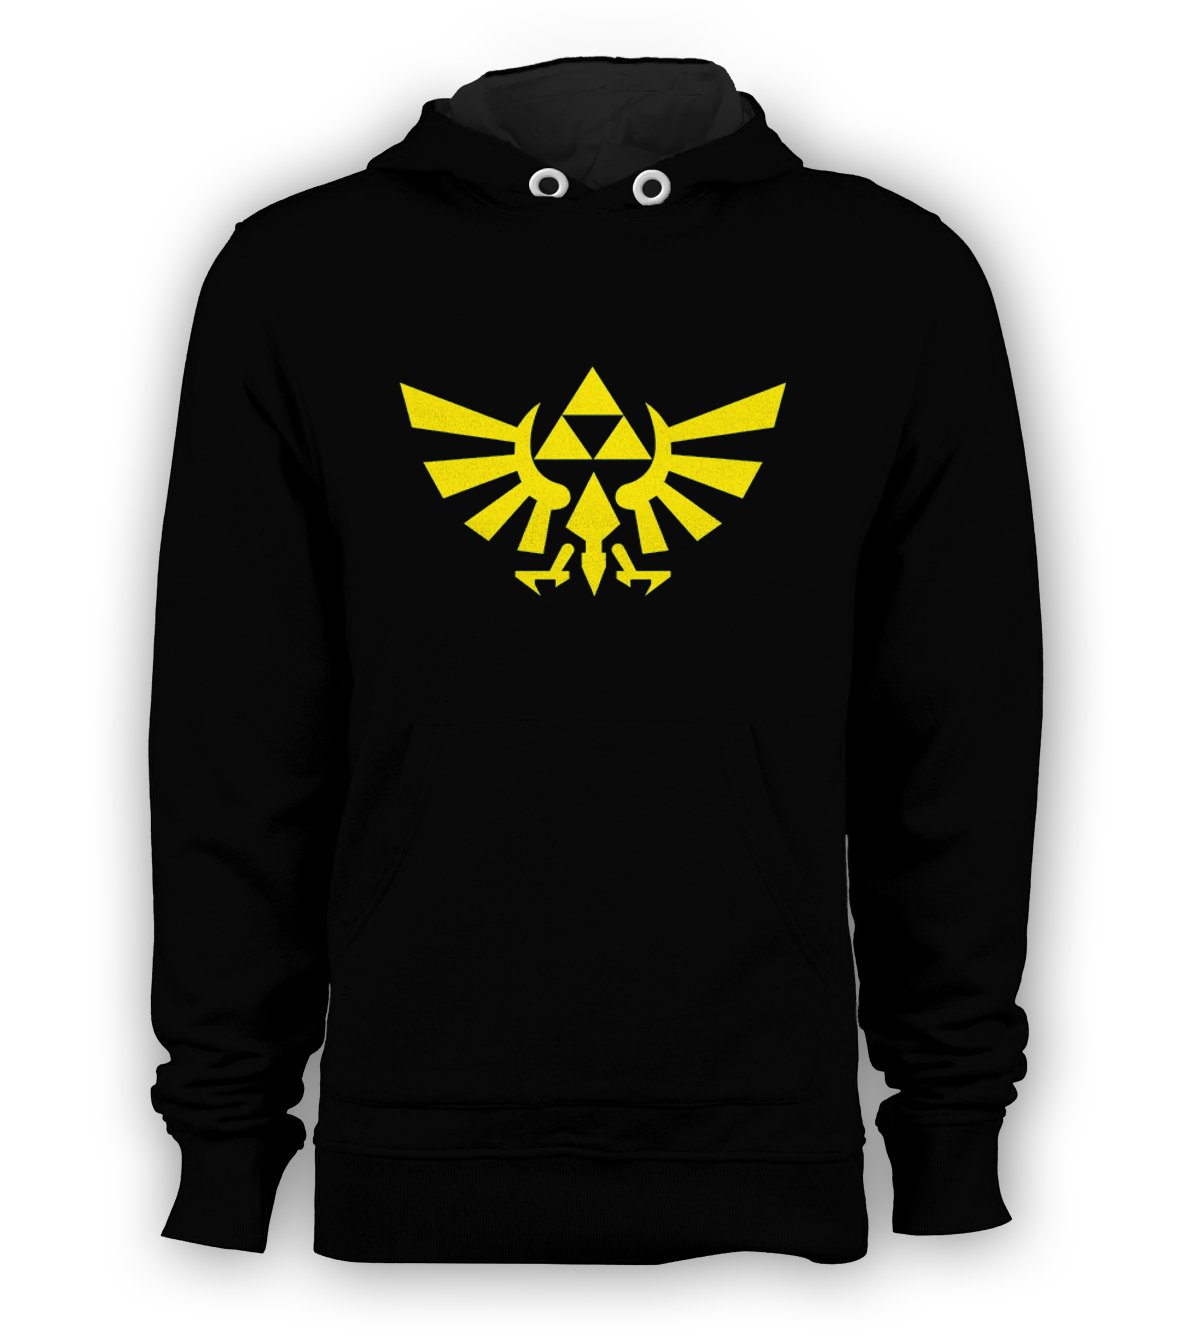 The Legend of Zelda Wings Games Pullover Hoodie Men Sweatshirts Size S to 3XL New Black